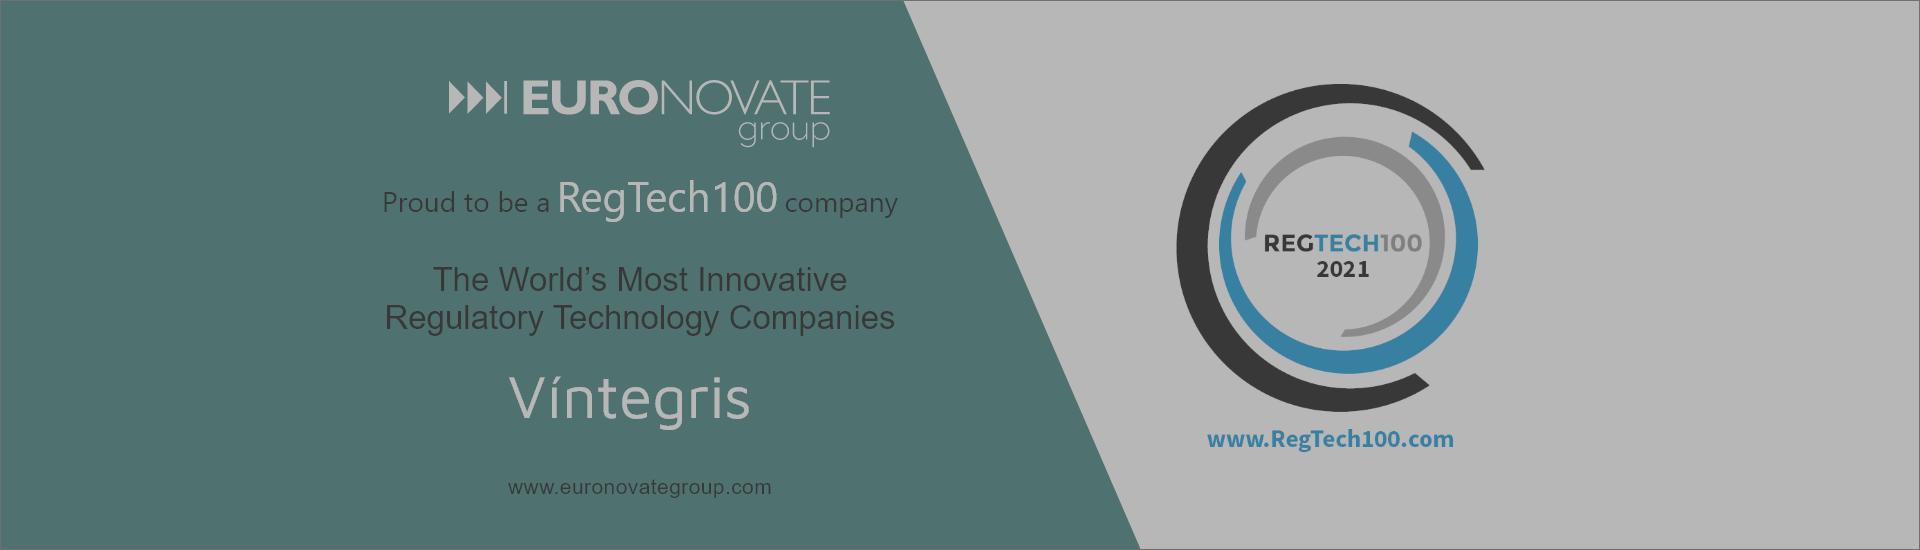 EURONOVATE GROUP parent company of Víntegris, part of RegTech100 list of most innovative companies for 2021